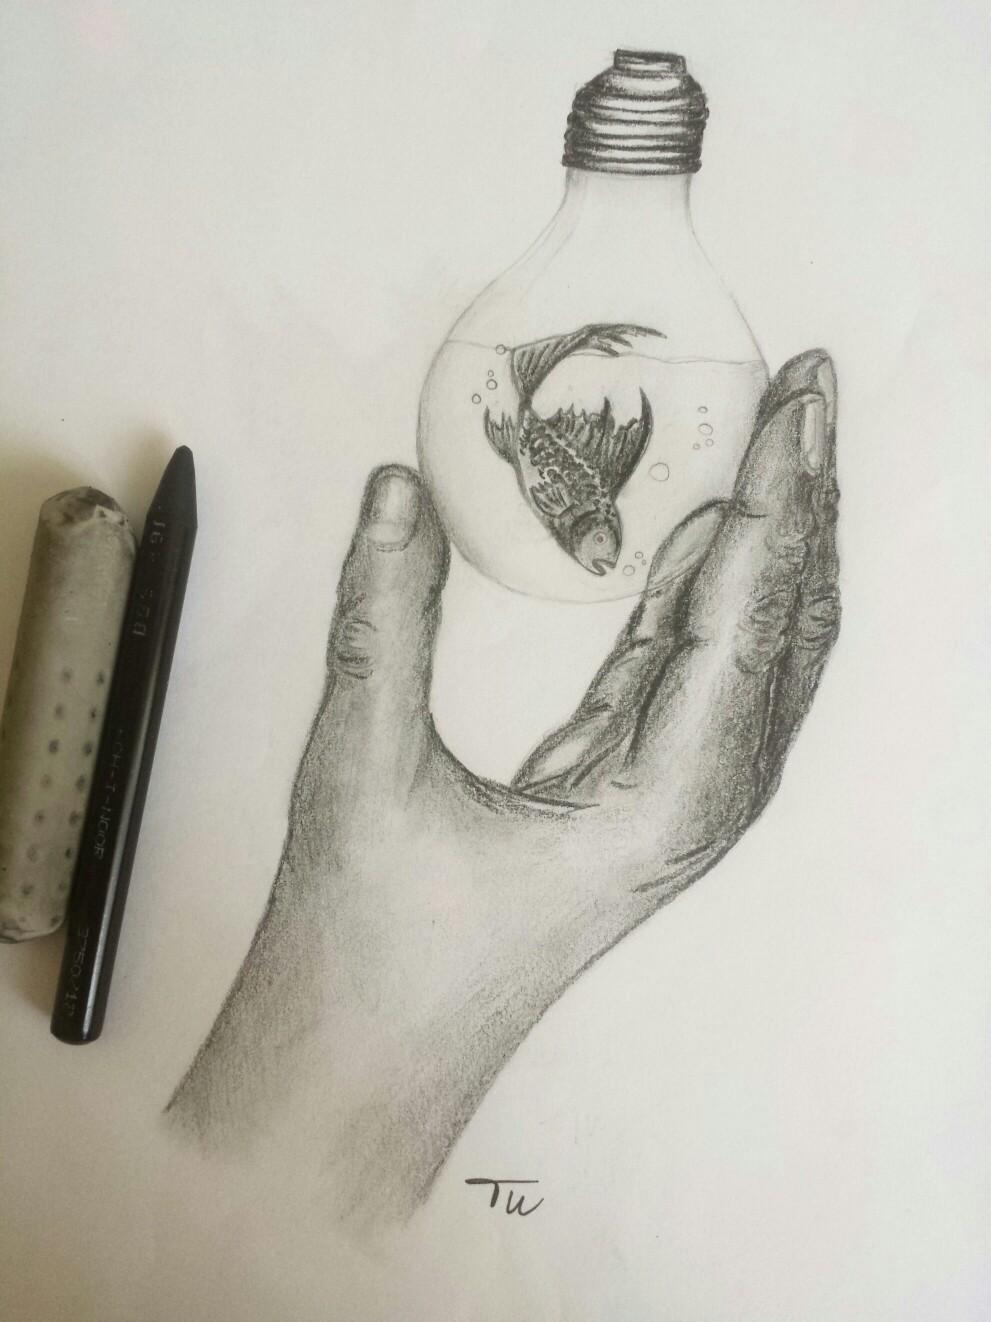 991x1322 Hand, Lightbulb, Fish Pencil Drawing By Tu Art, Drawings